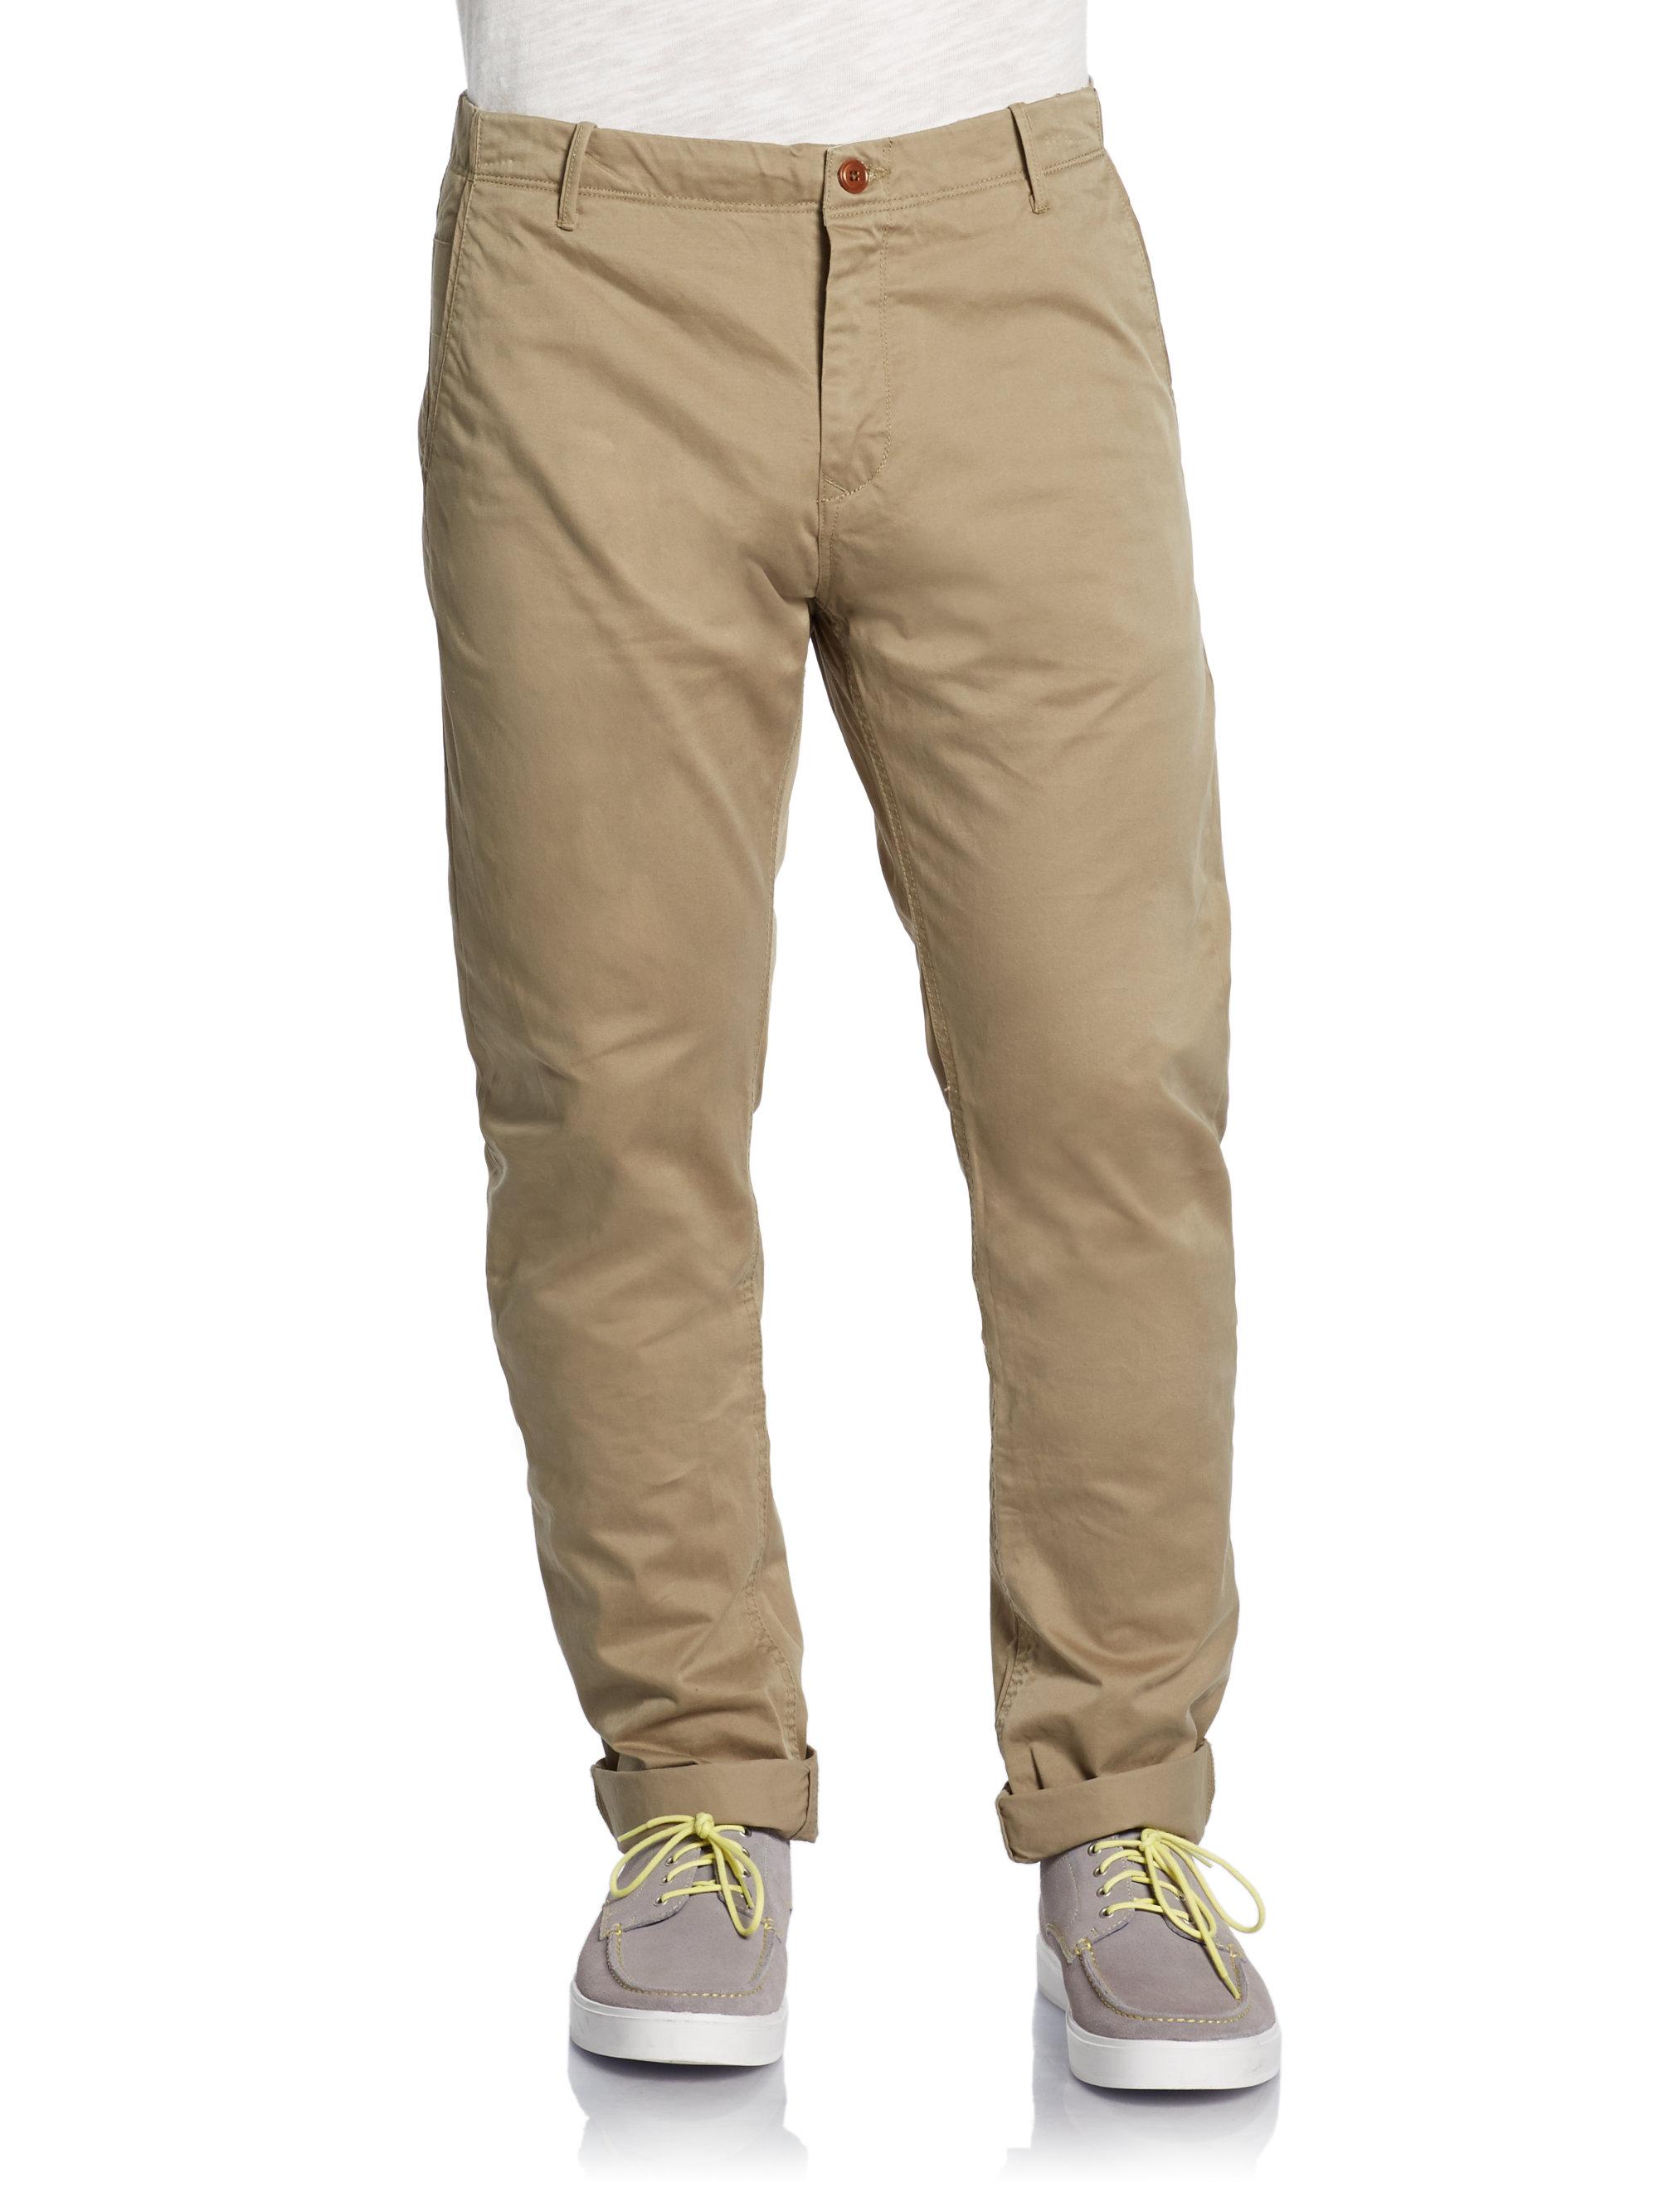 Scotch Amp Soda Cuffed Chino Pants In Khaki For Men Lyst